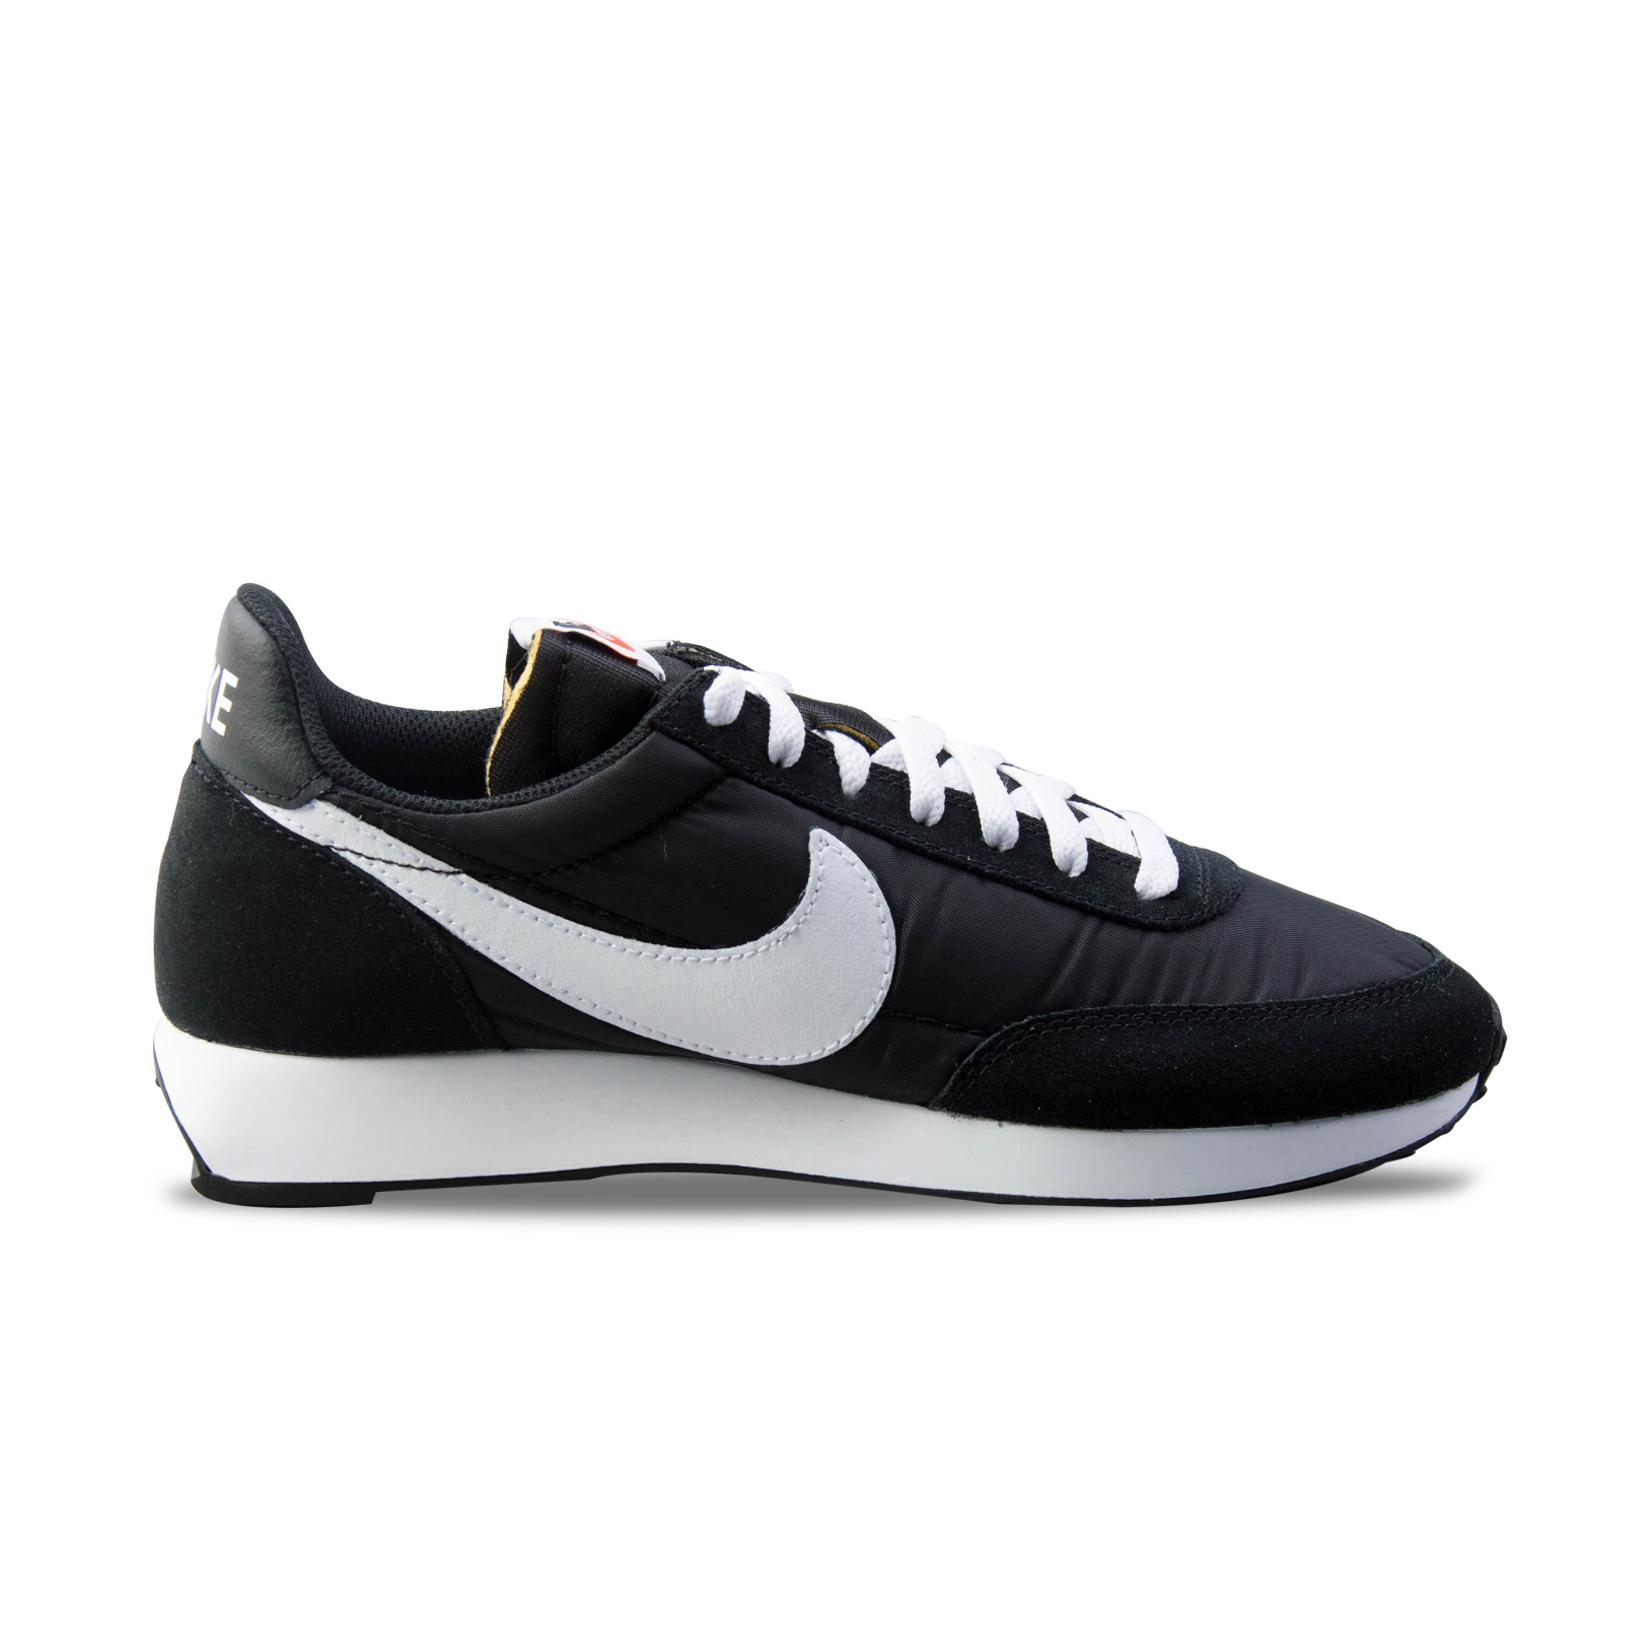 Nike Air Tailwind 79 Black - White